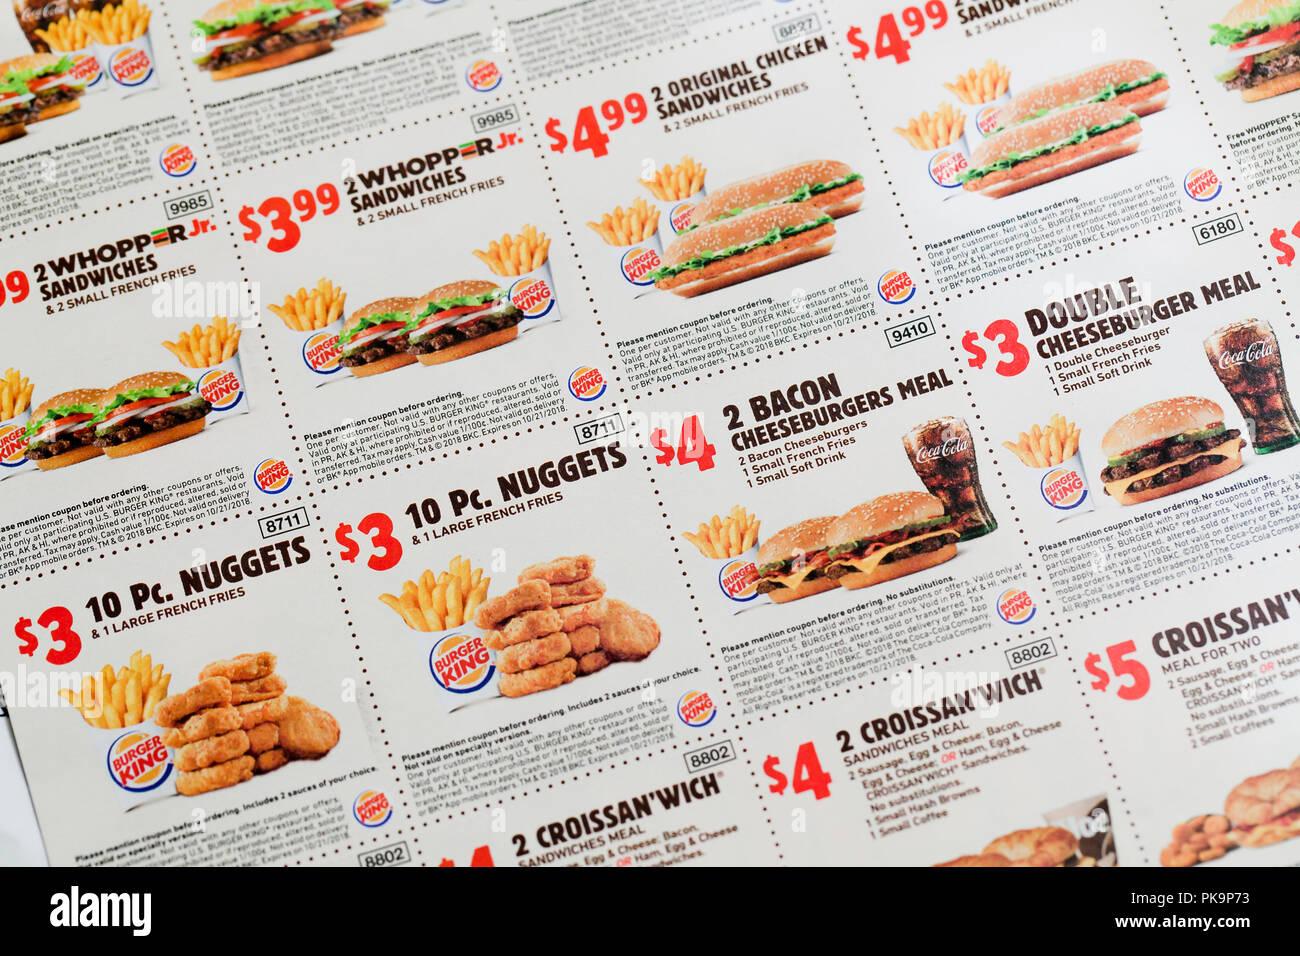 Burger King Coupons Fast Food Coupon Usa Stock Photo 218417895